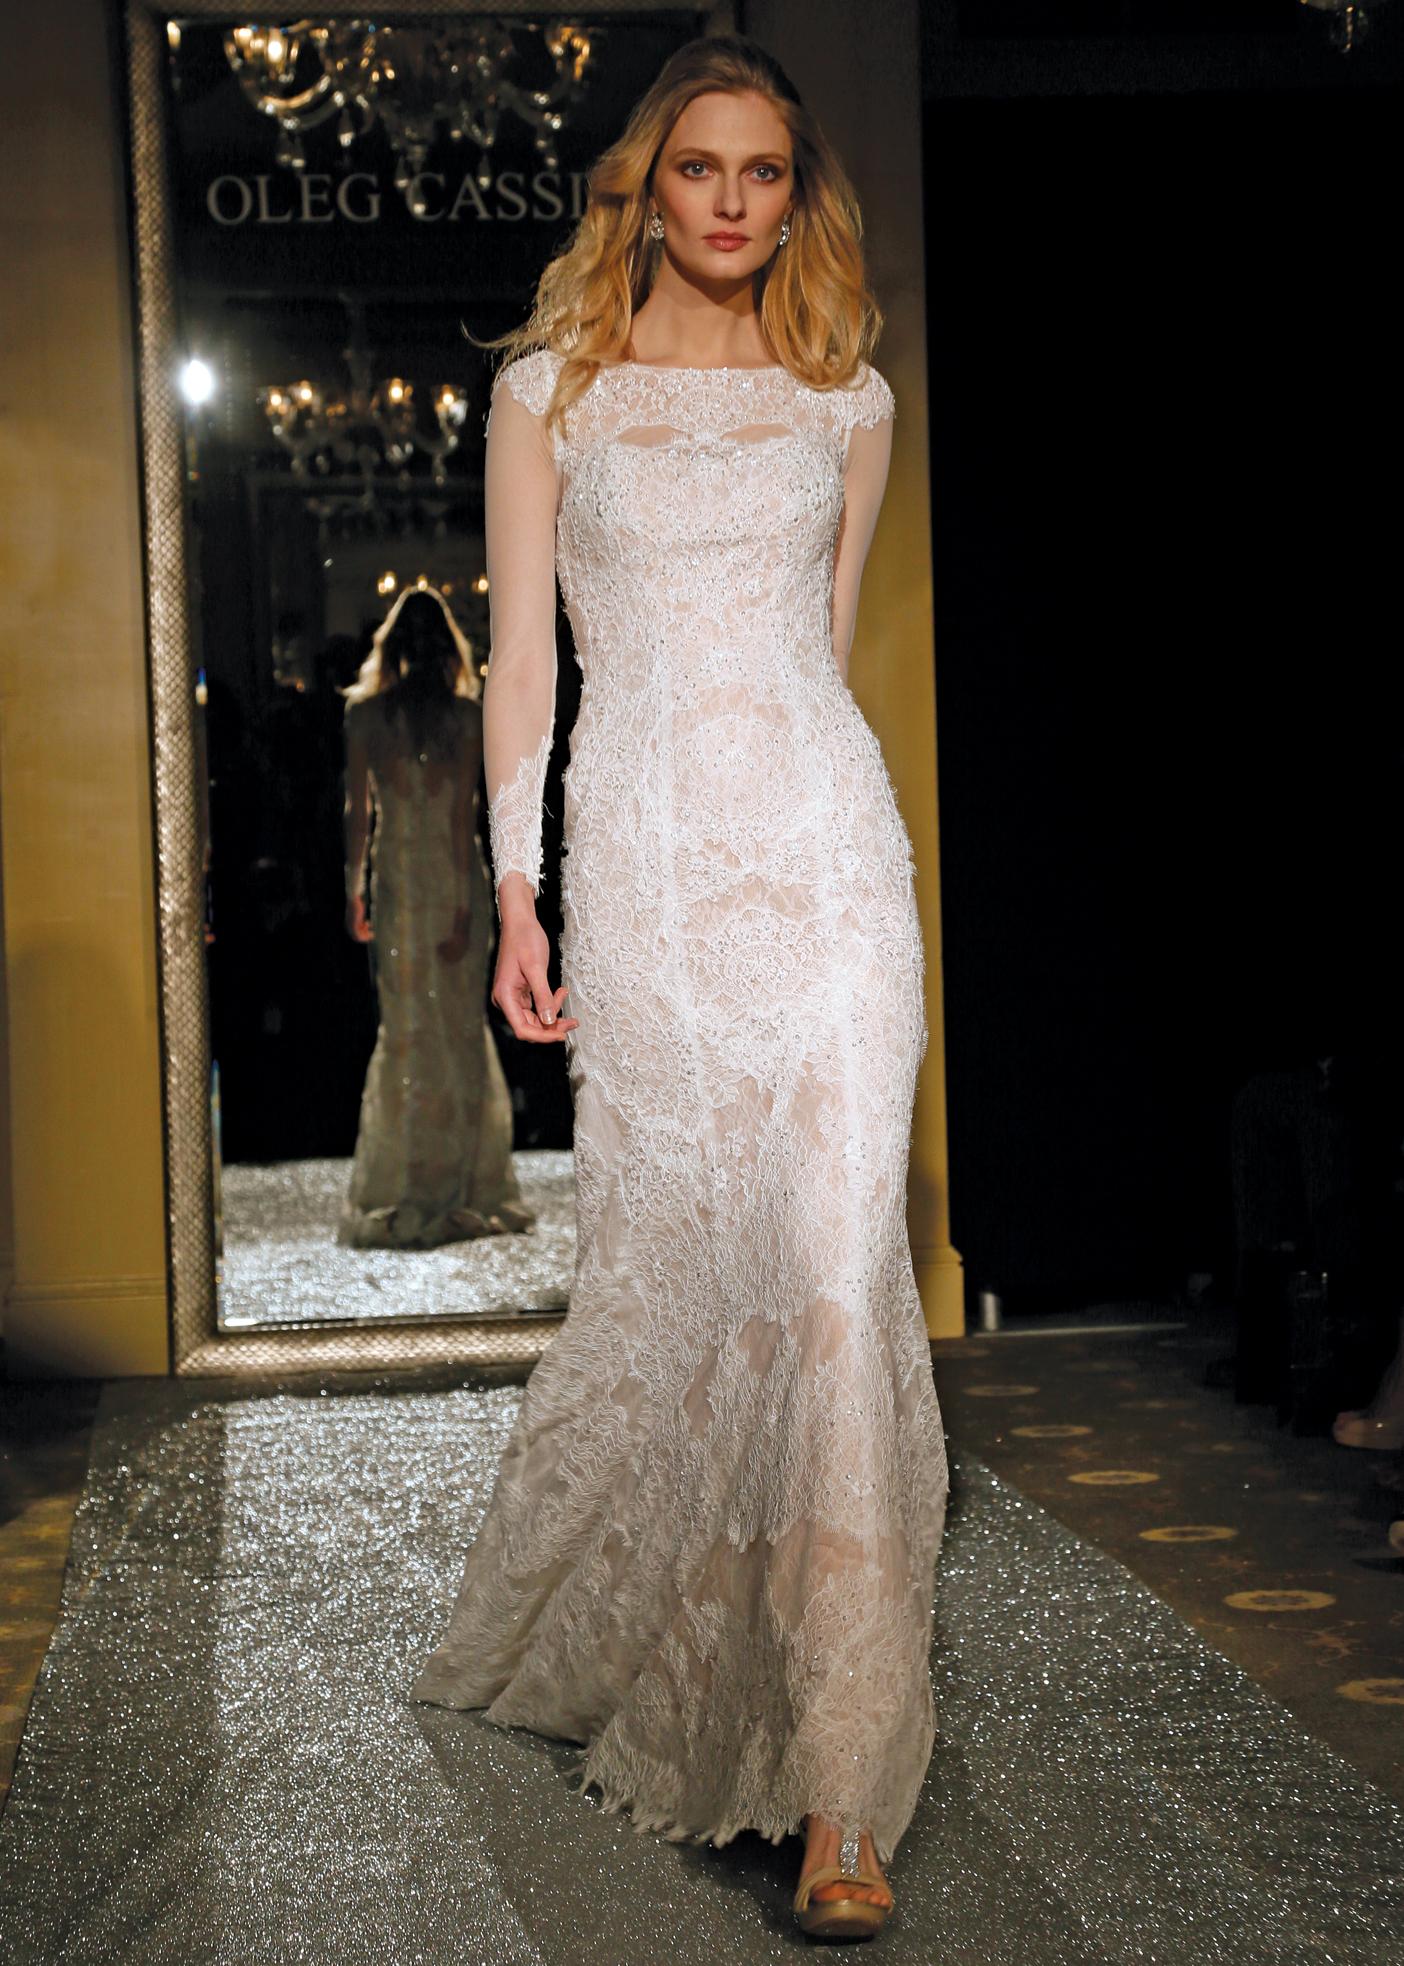 Oleg Cassini Champagne Lace Wedding Dress